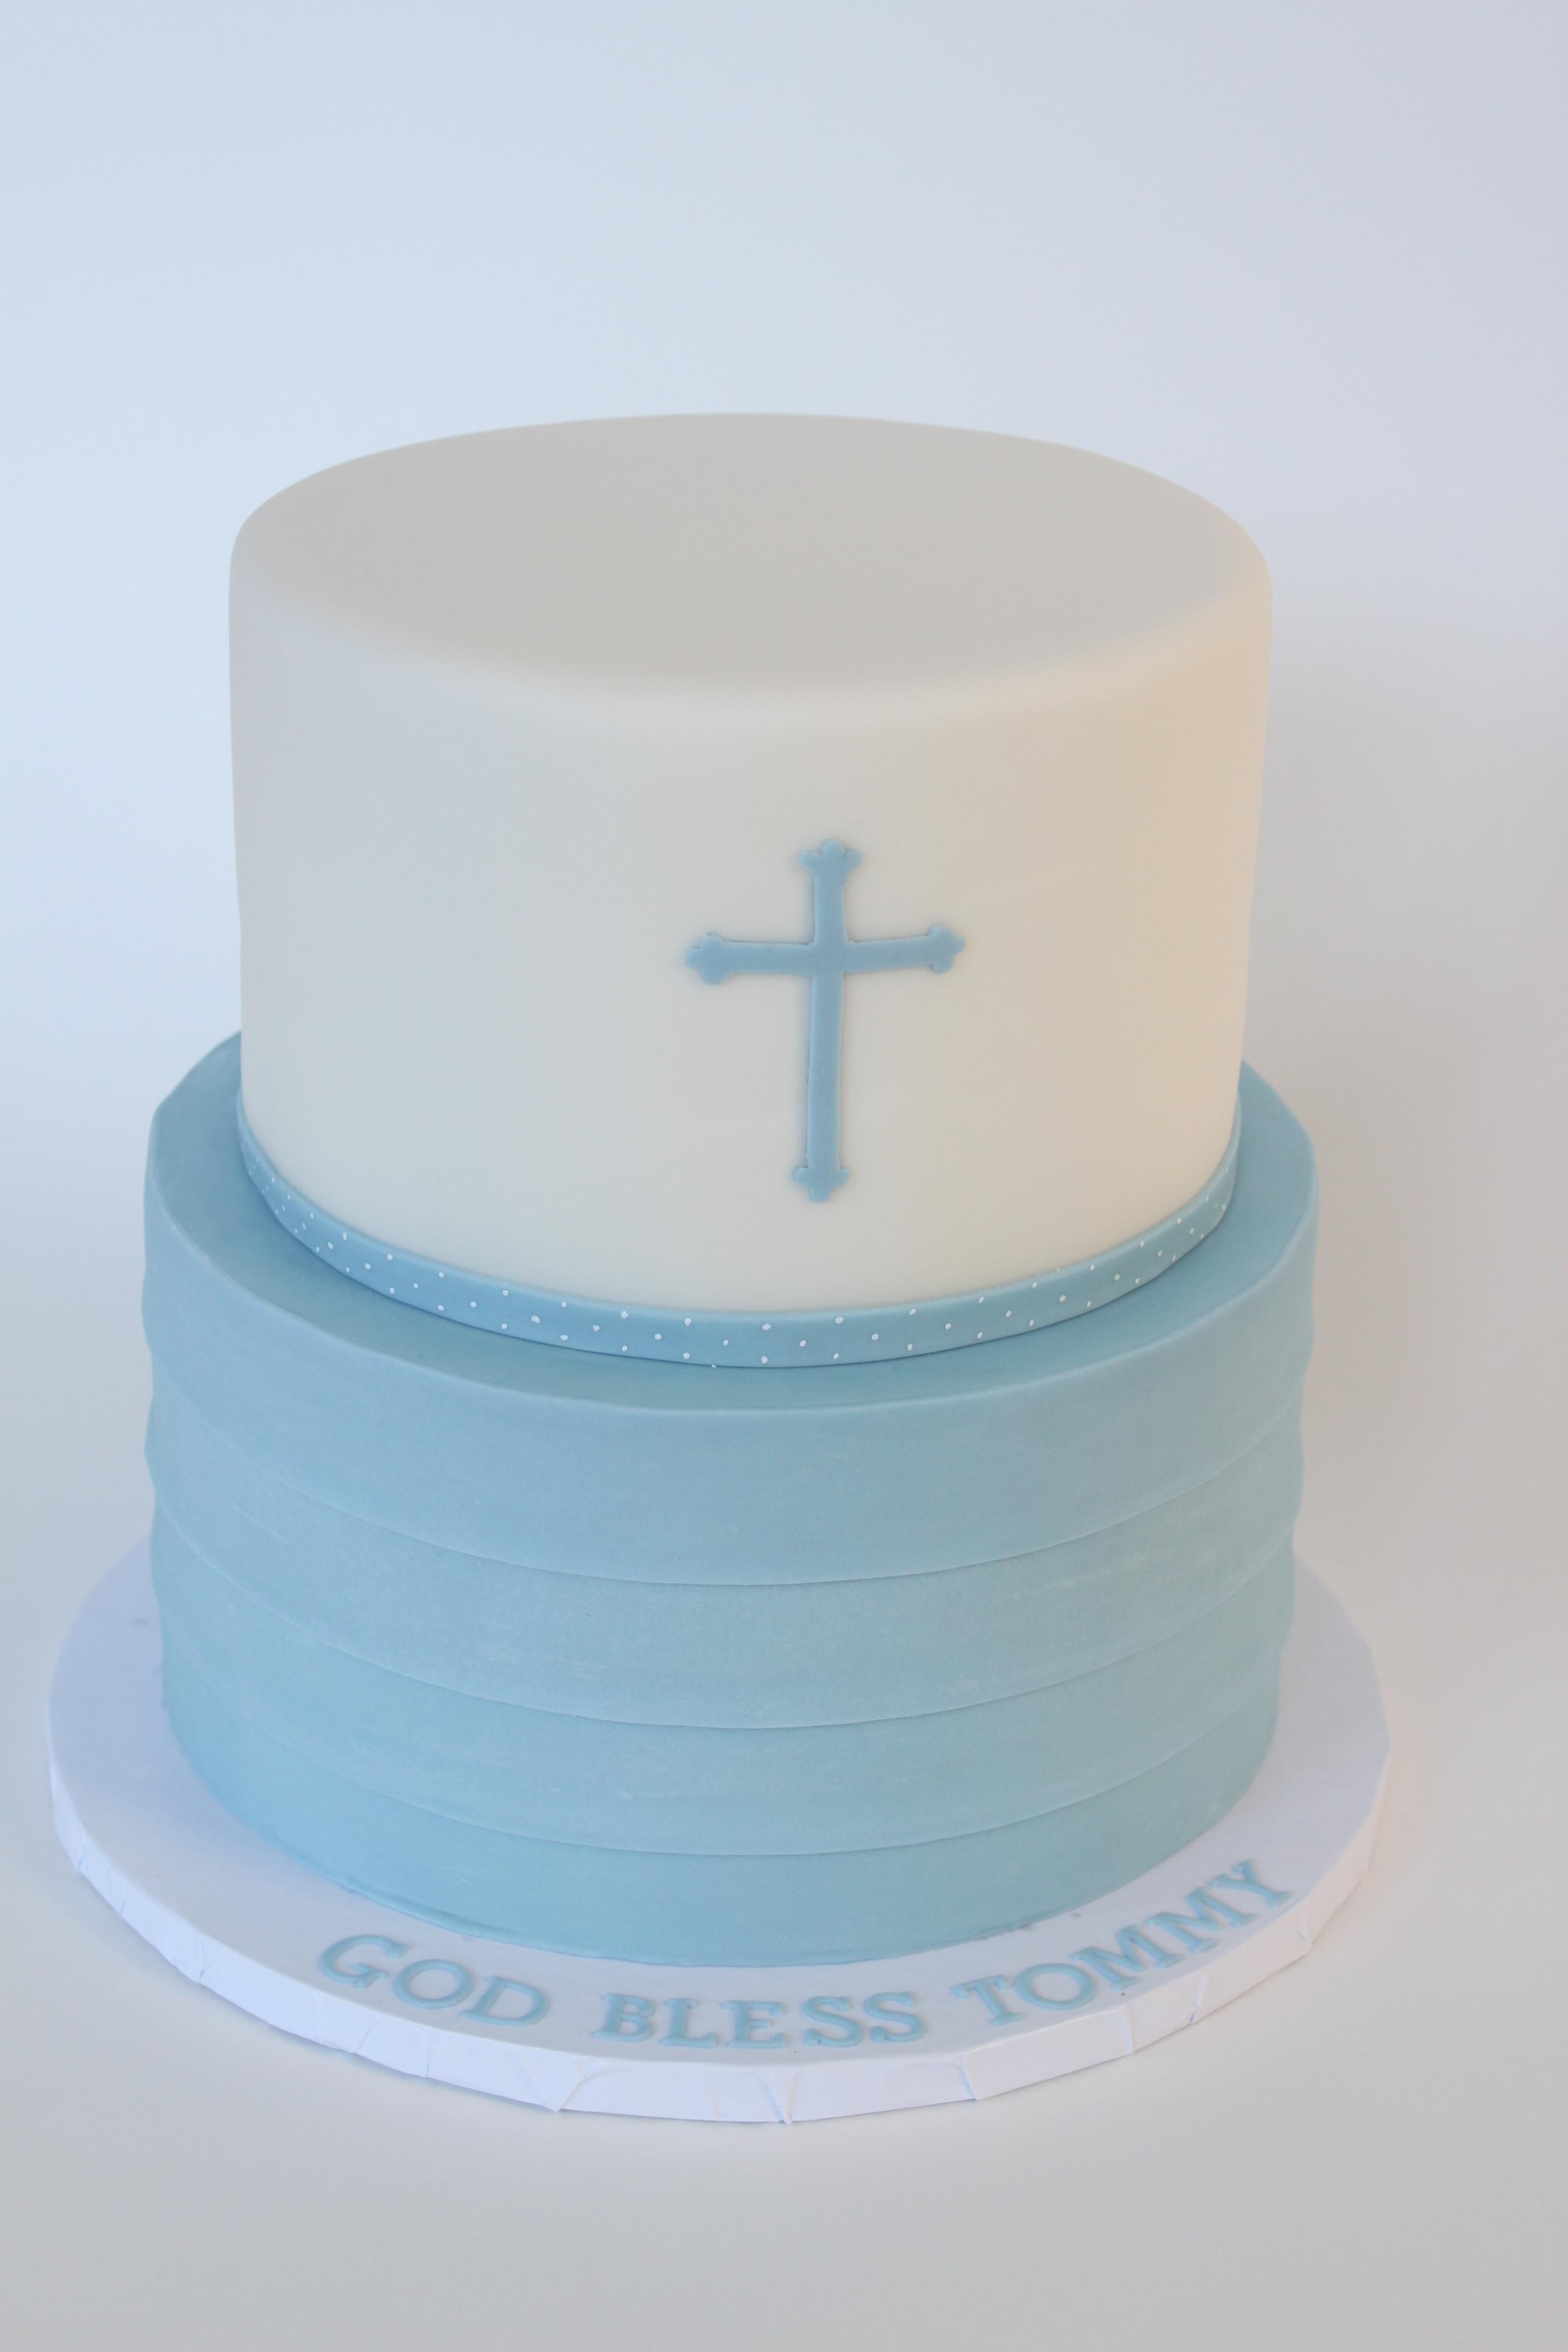 baptism cake vertical 9940.jpg